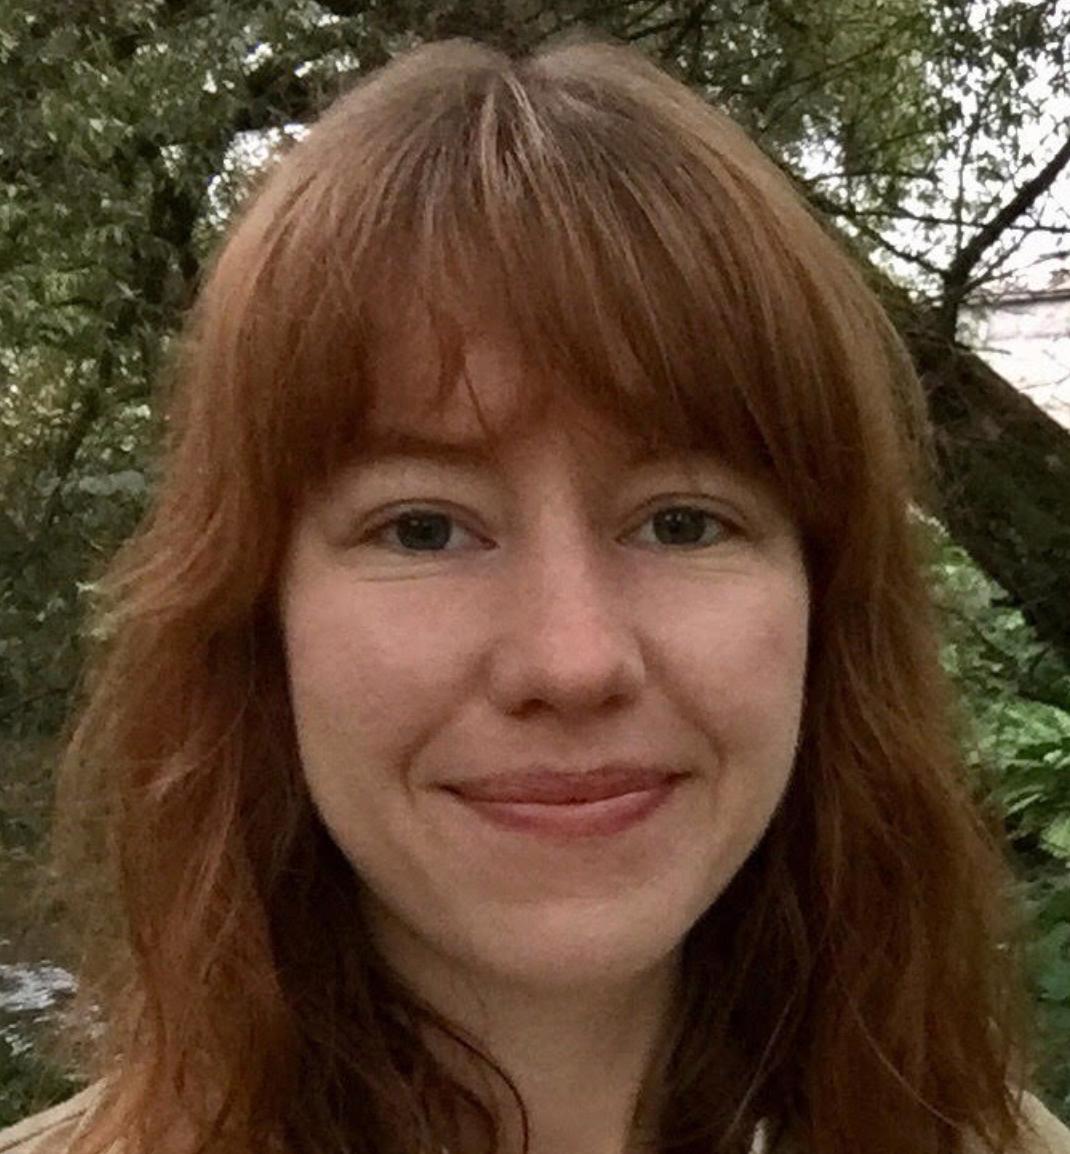 Nora Dåsnes